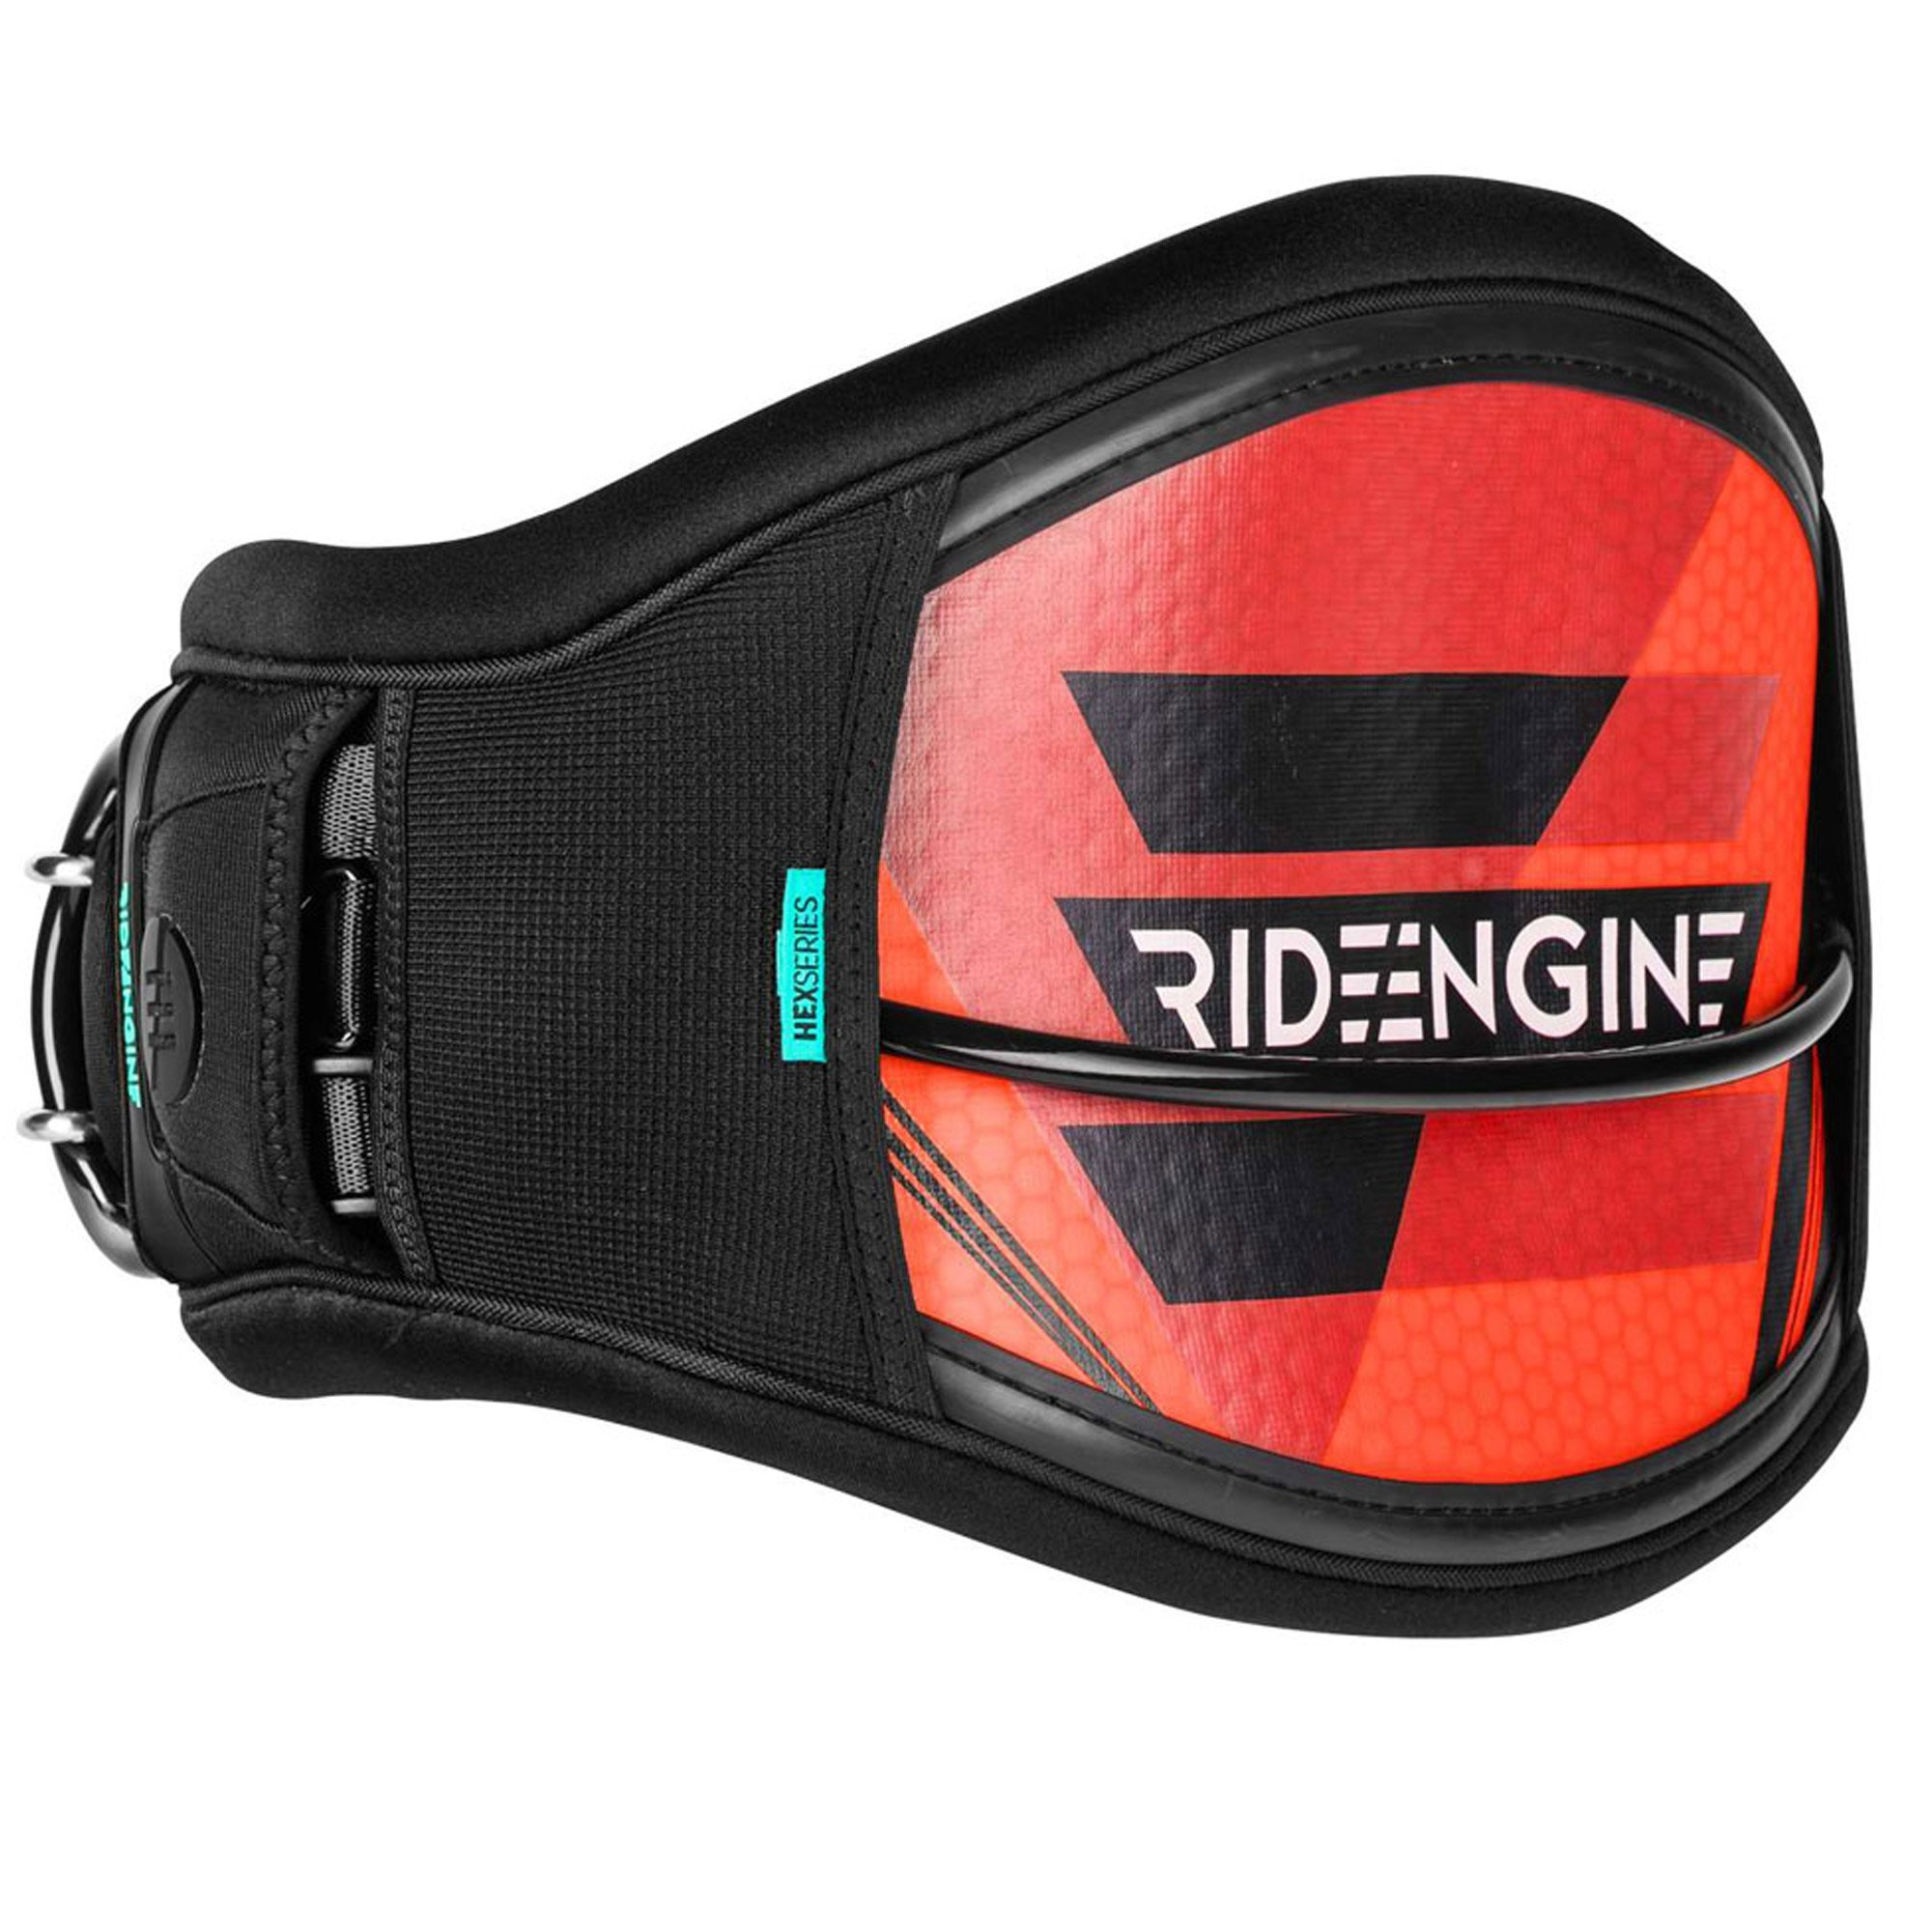 Ride Engine Kiteboarding HarnessHex-Core Orange Harness L by Ride Engine (Image #1)